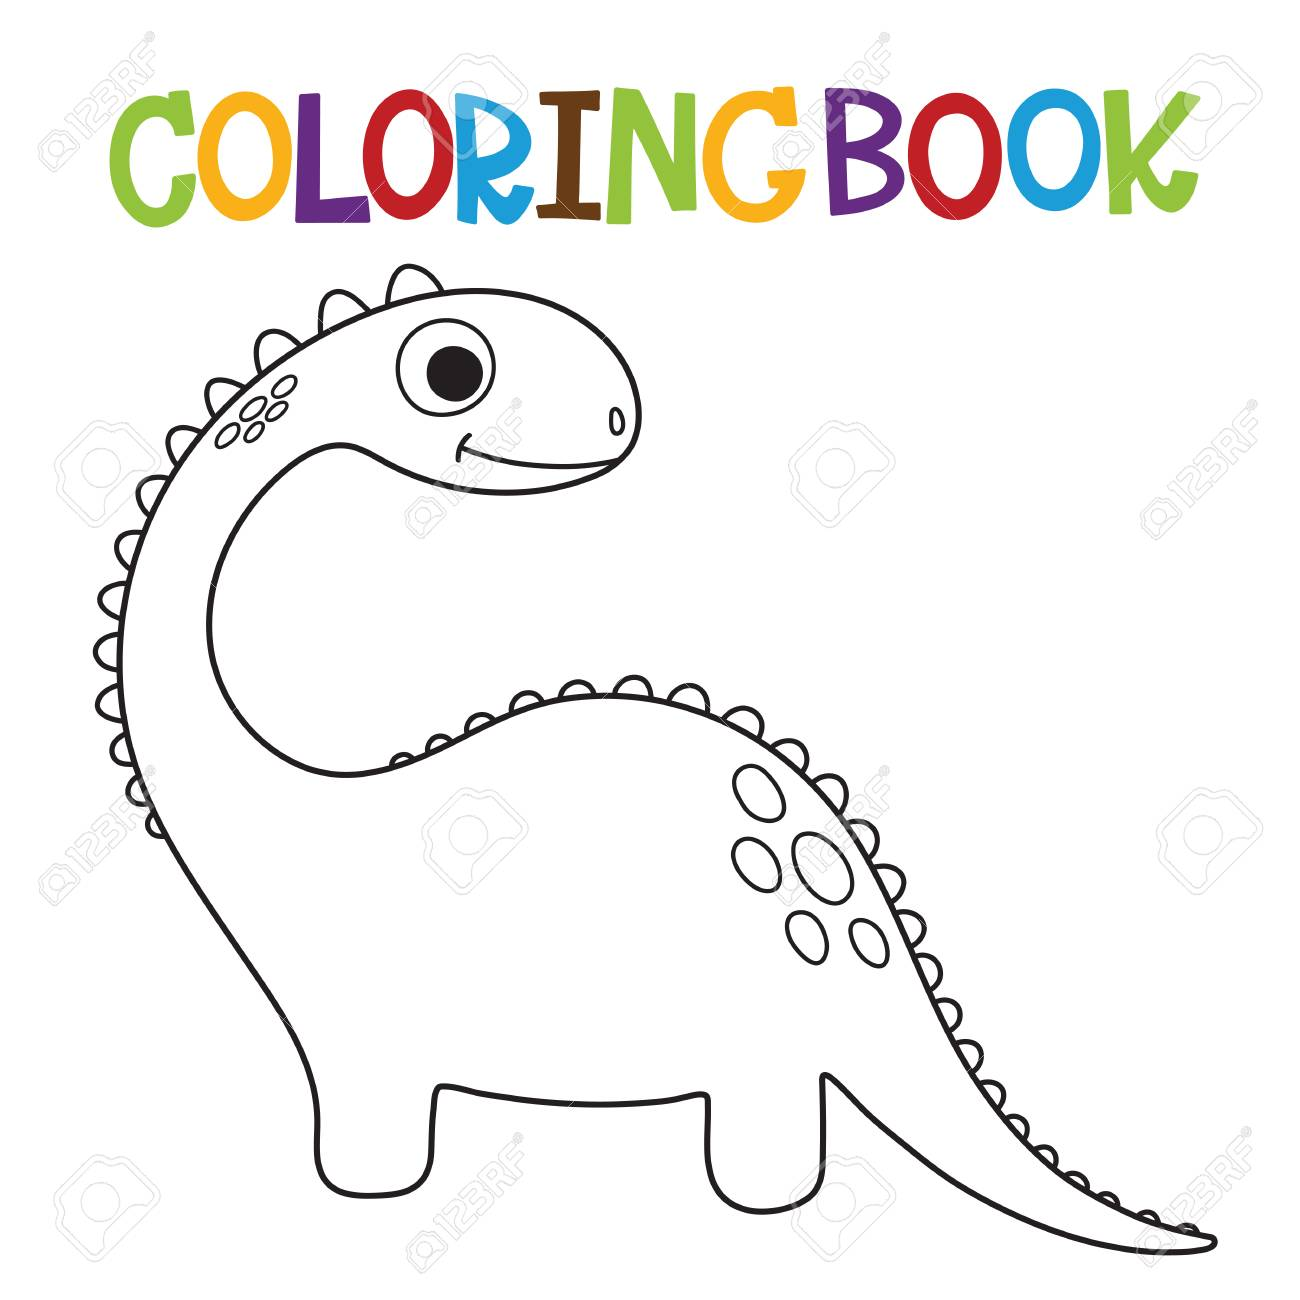 Cute Dinosaur Coloring Book Vector Illustration Royalty Free